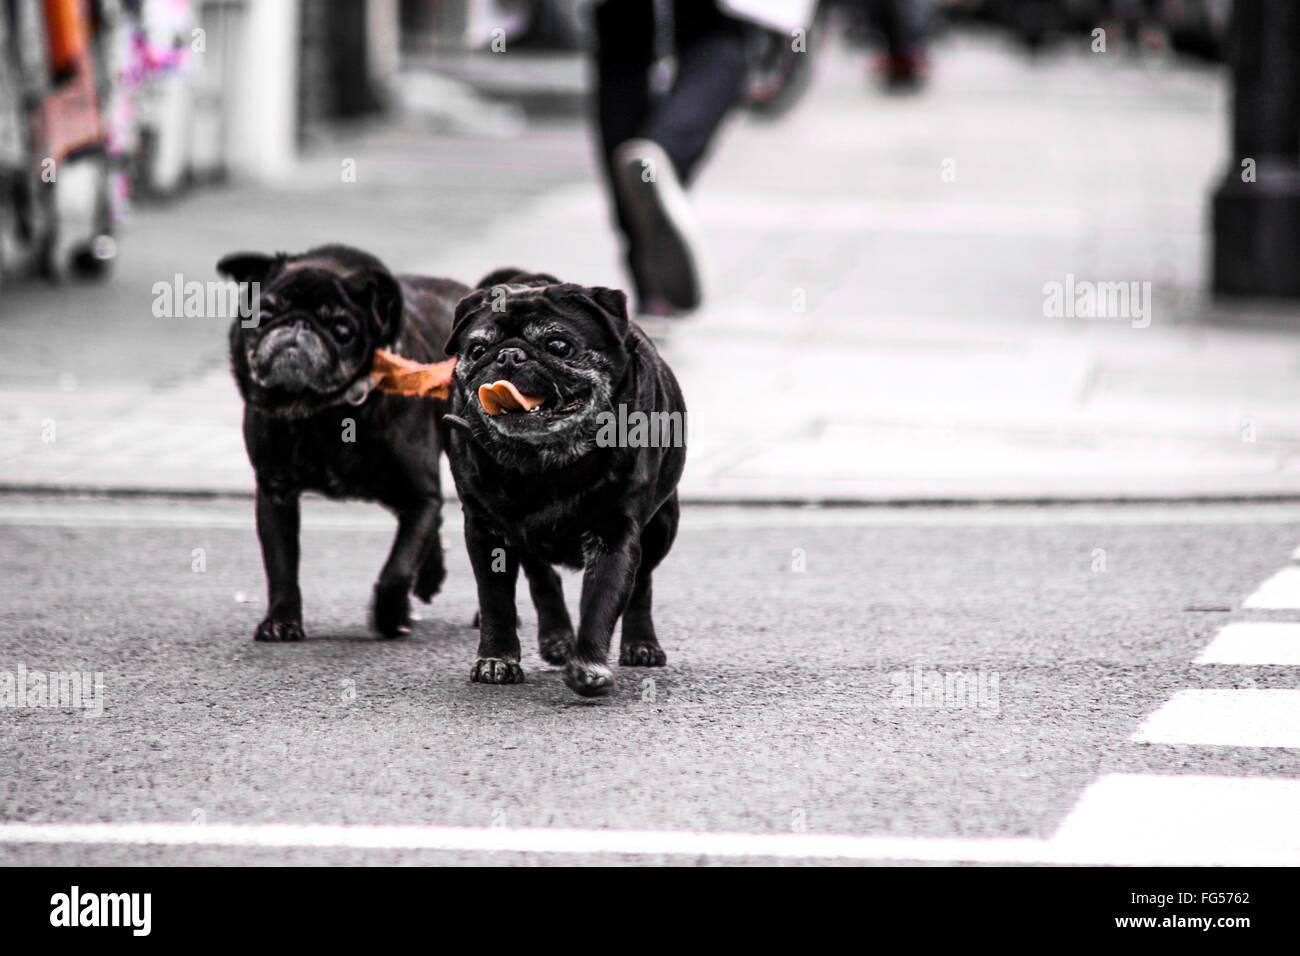 Pugs Walking On City Street - Stock Image